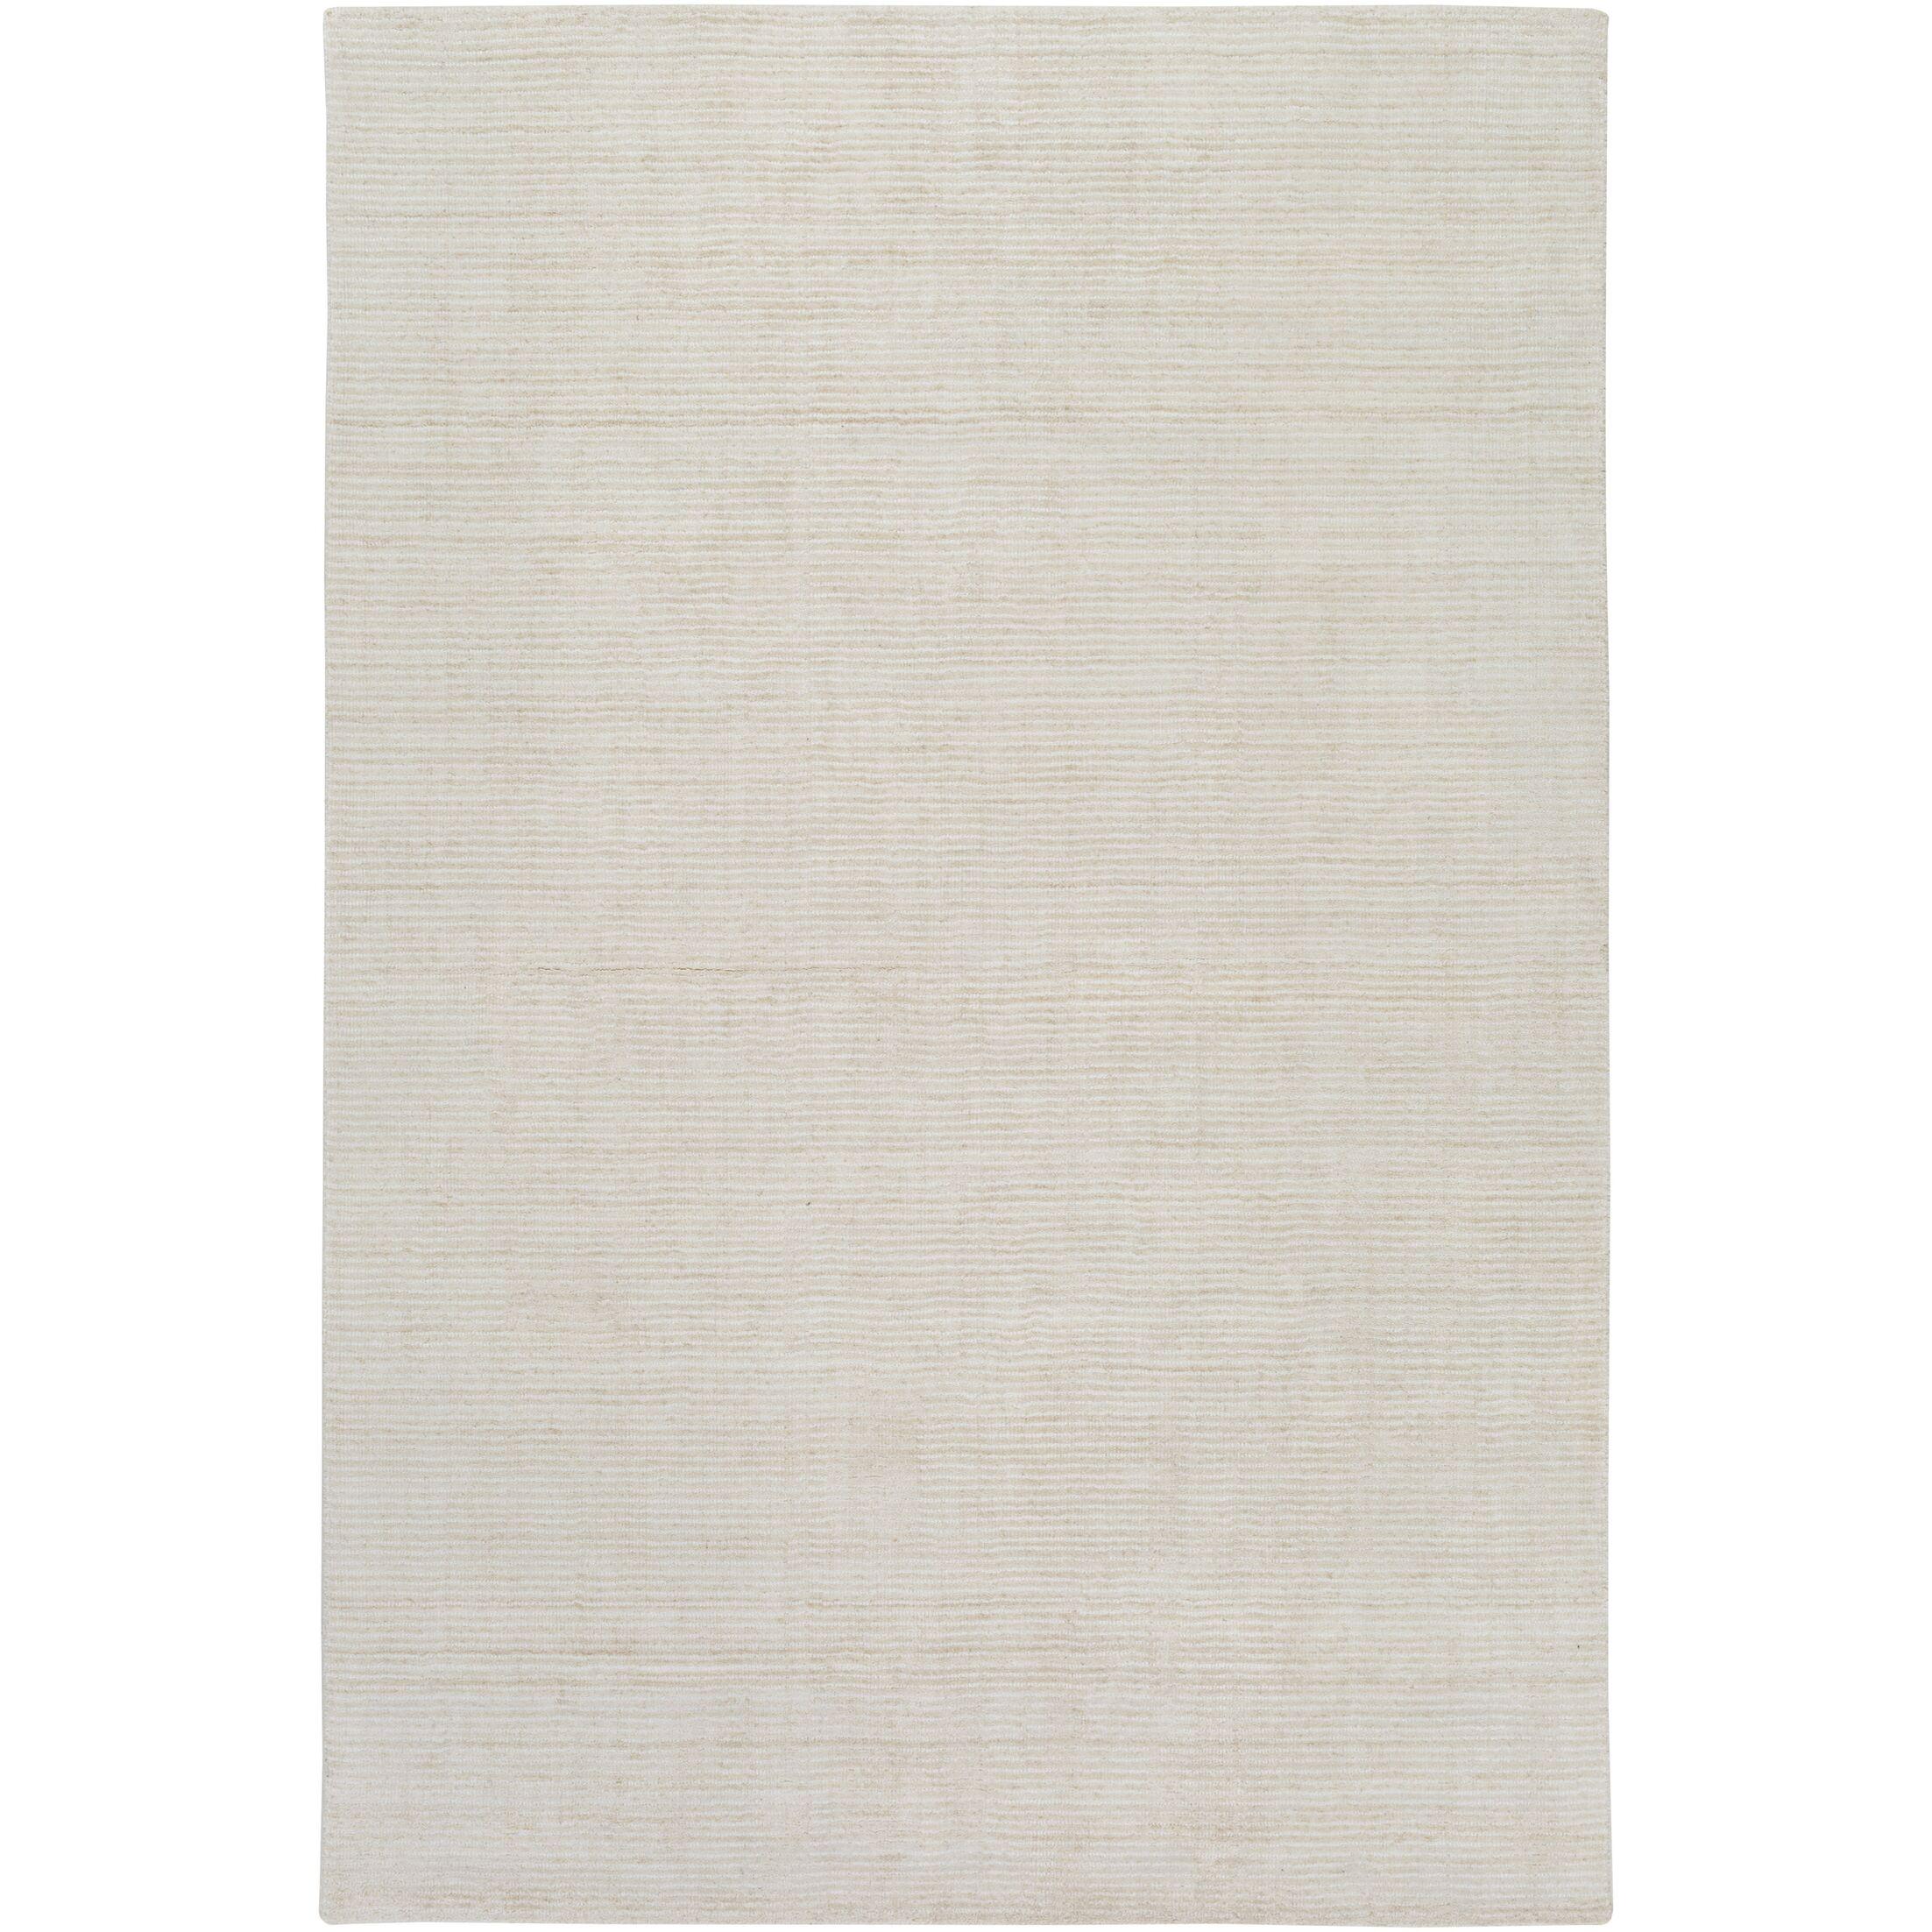 Chesterbrook Hand-Loomed Khaki/Light Gray Area Rug Rug Size: Rectangle 2' x 3'